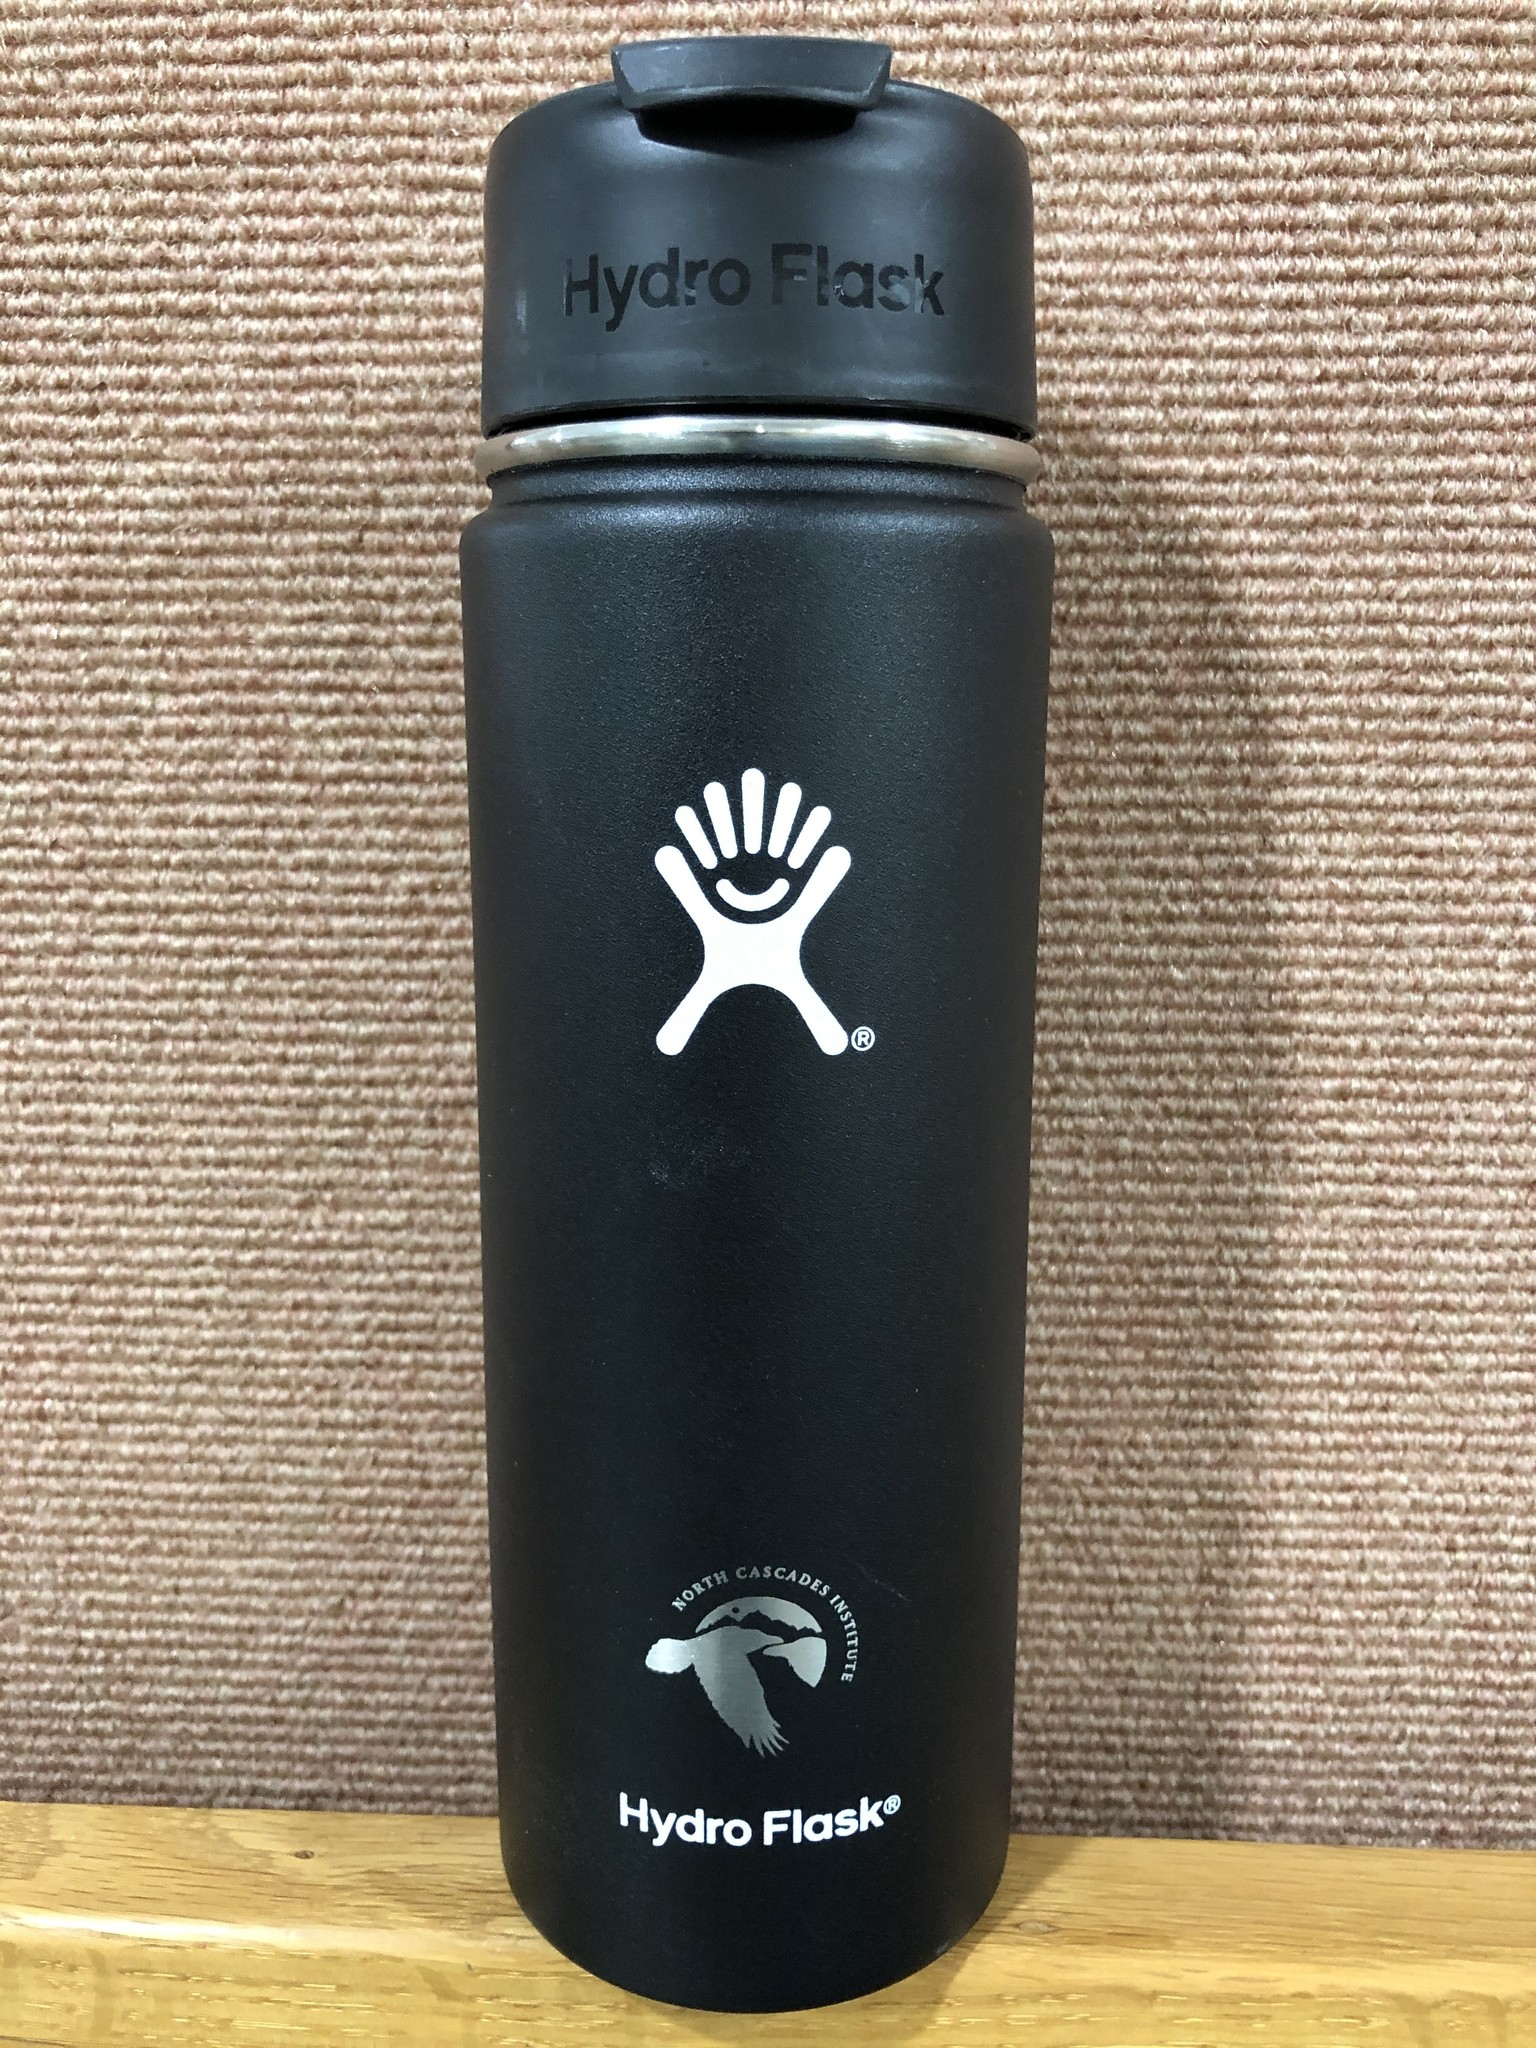 Hydro Flask Hot Drink Bottle NCNP Graphite 20 oz